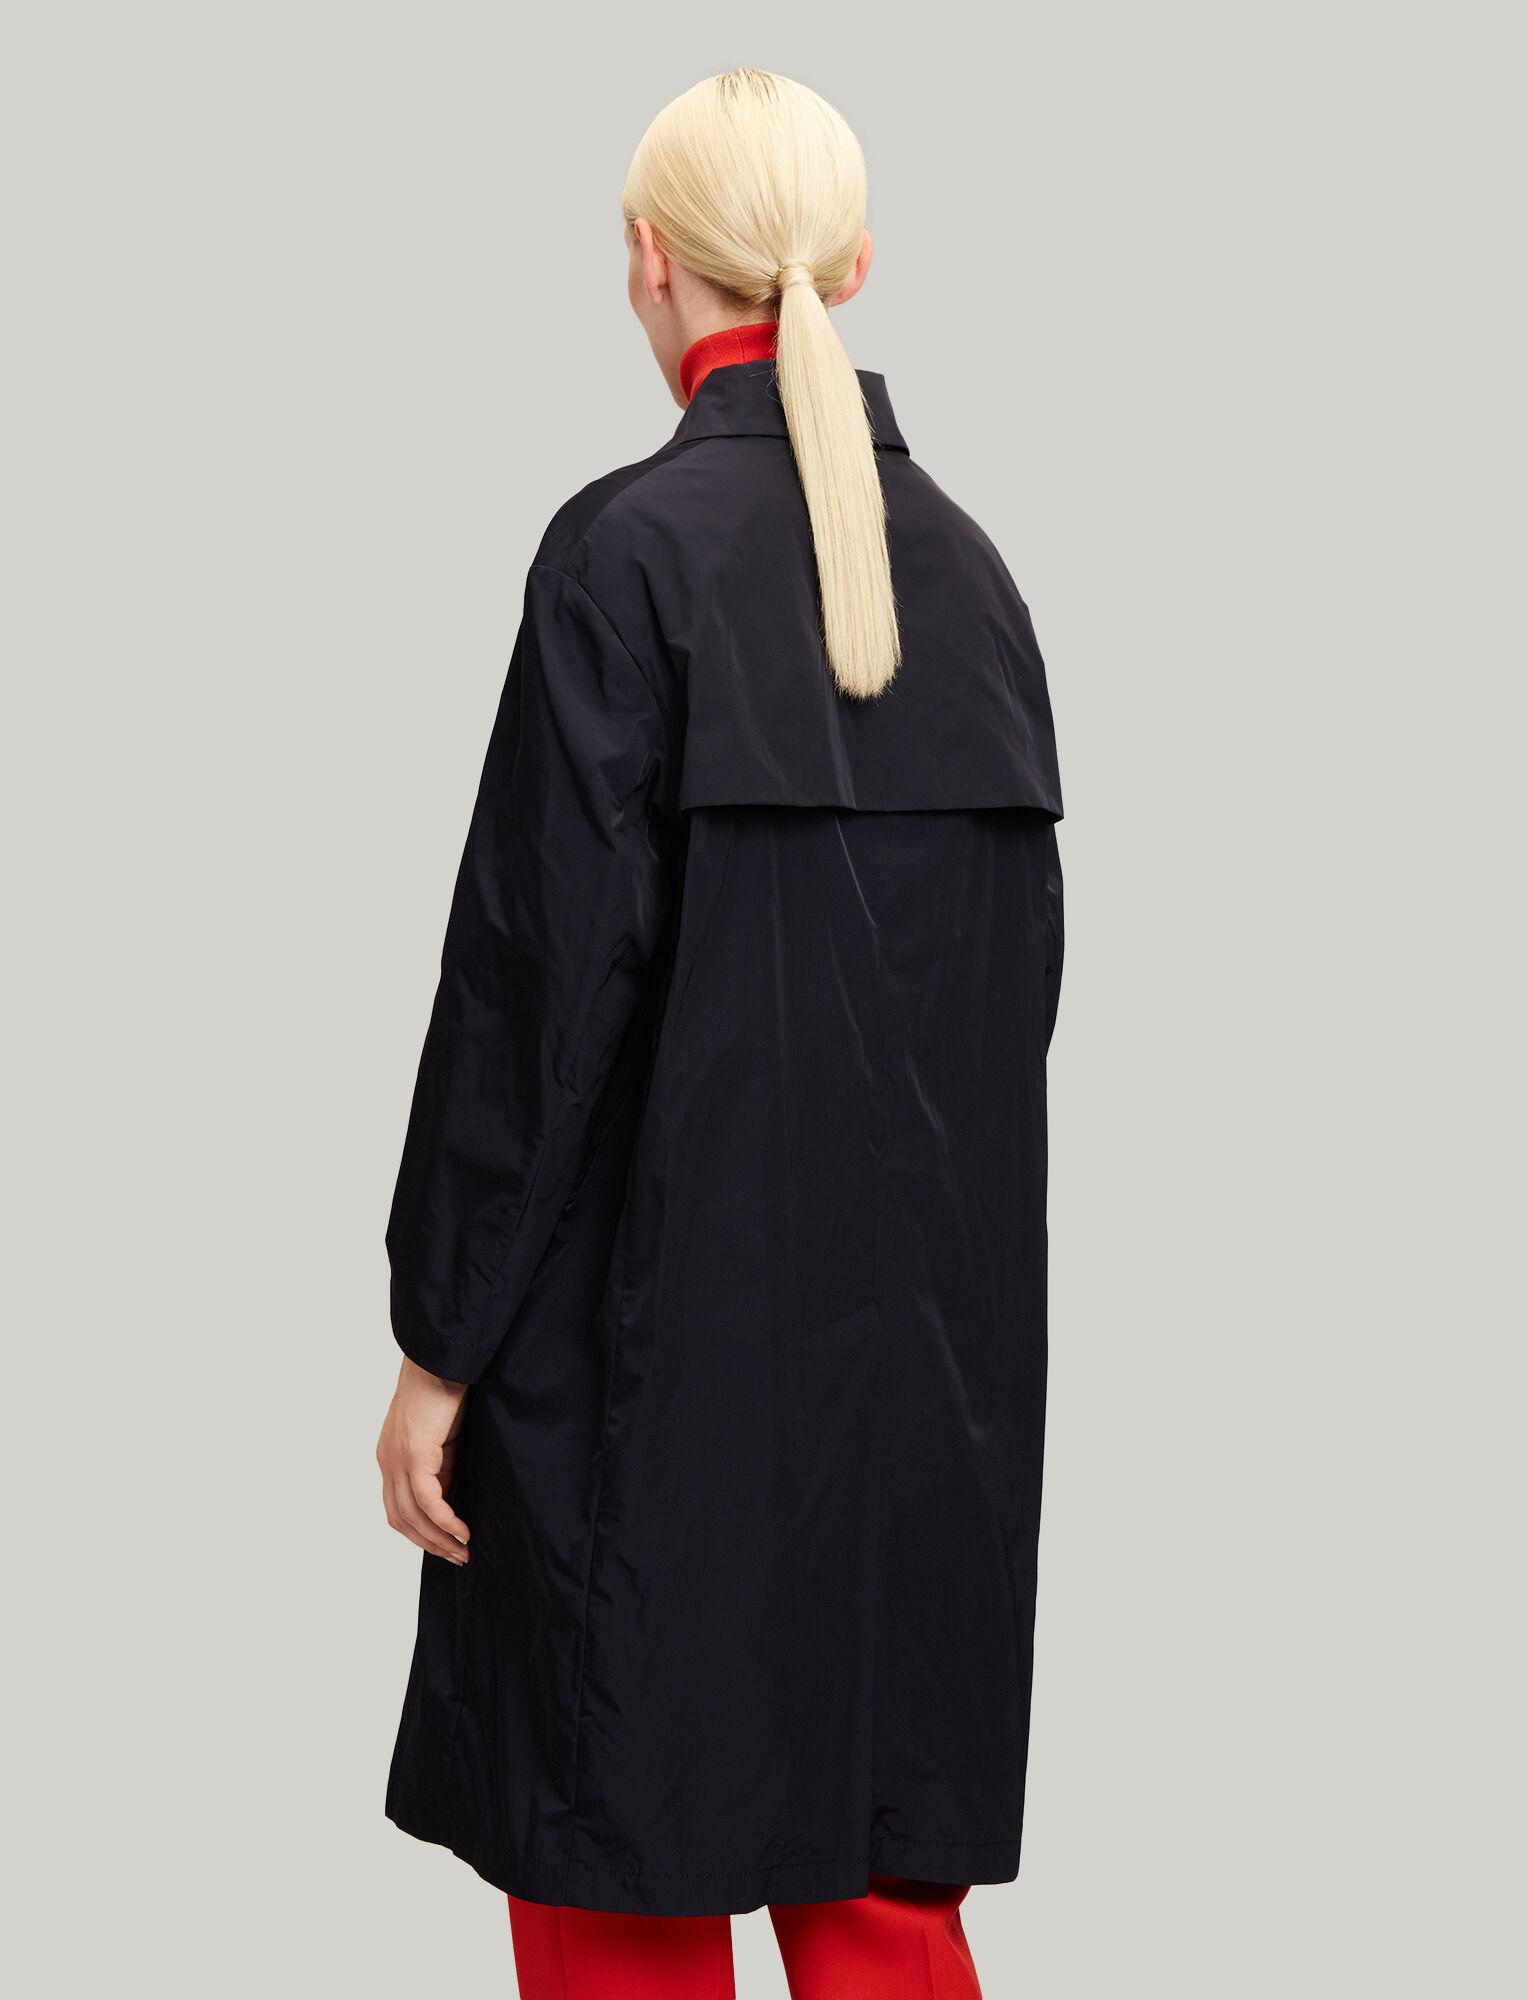 Joseph, Richter Taffeta Nylon Coat, in NAVY